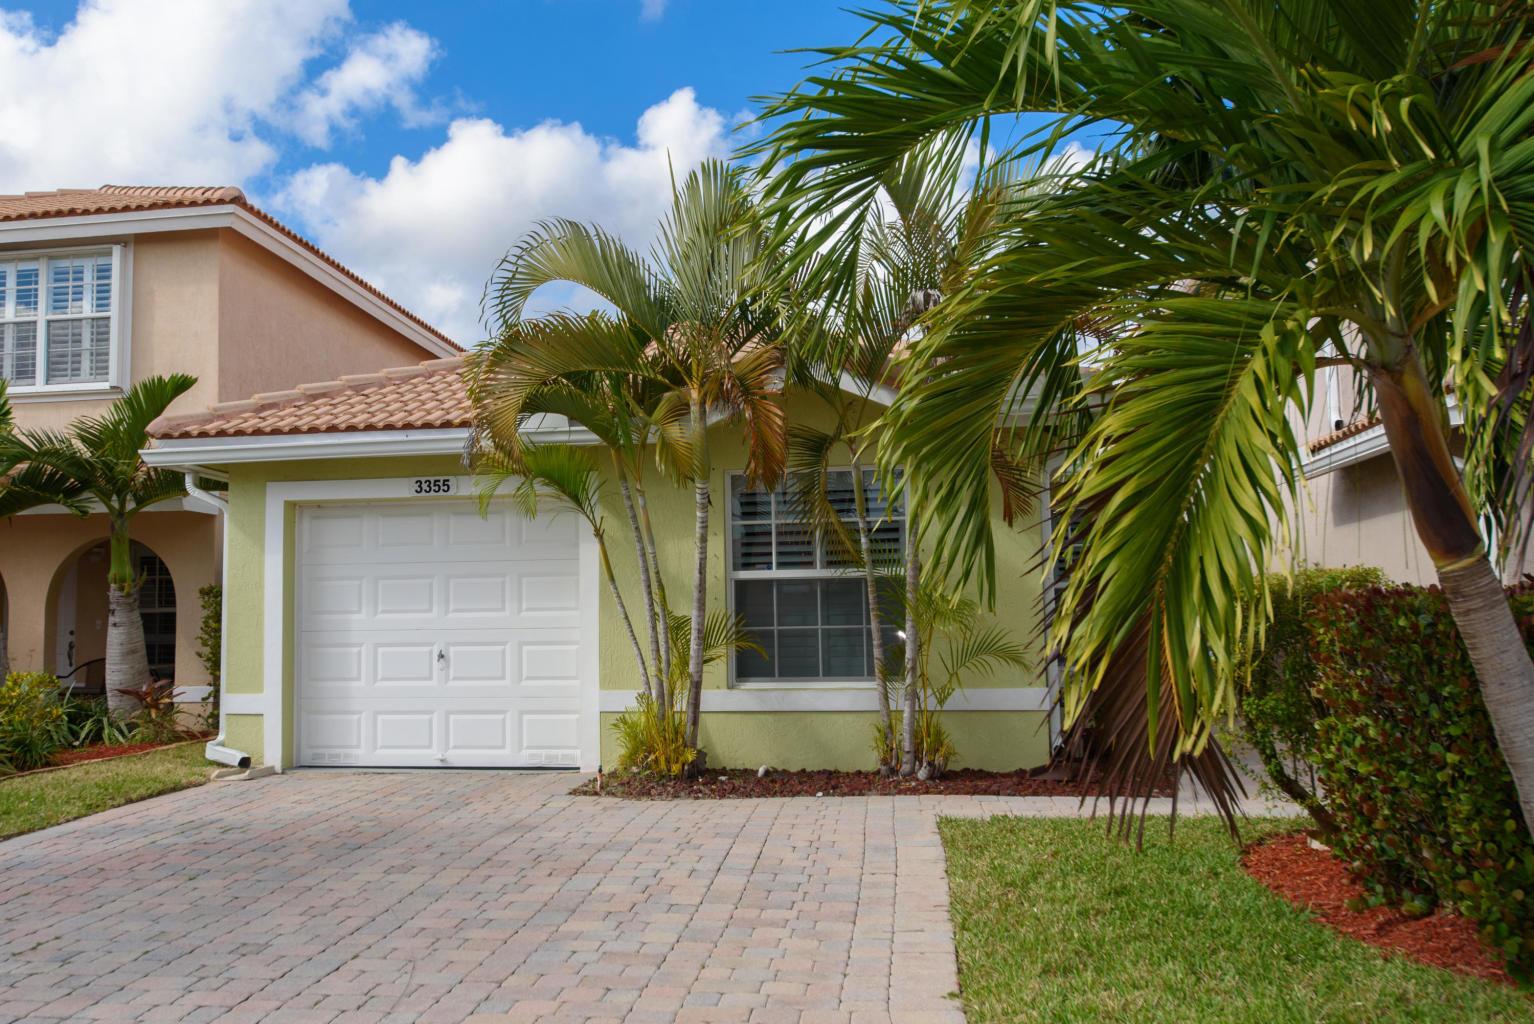 3355 Blue Fin Drive West Palm Beach, FL 33411